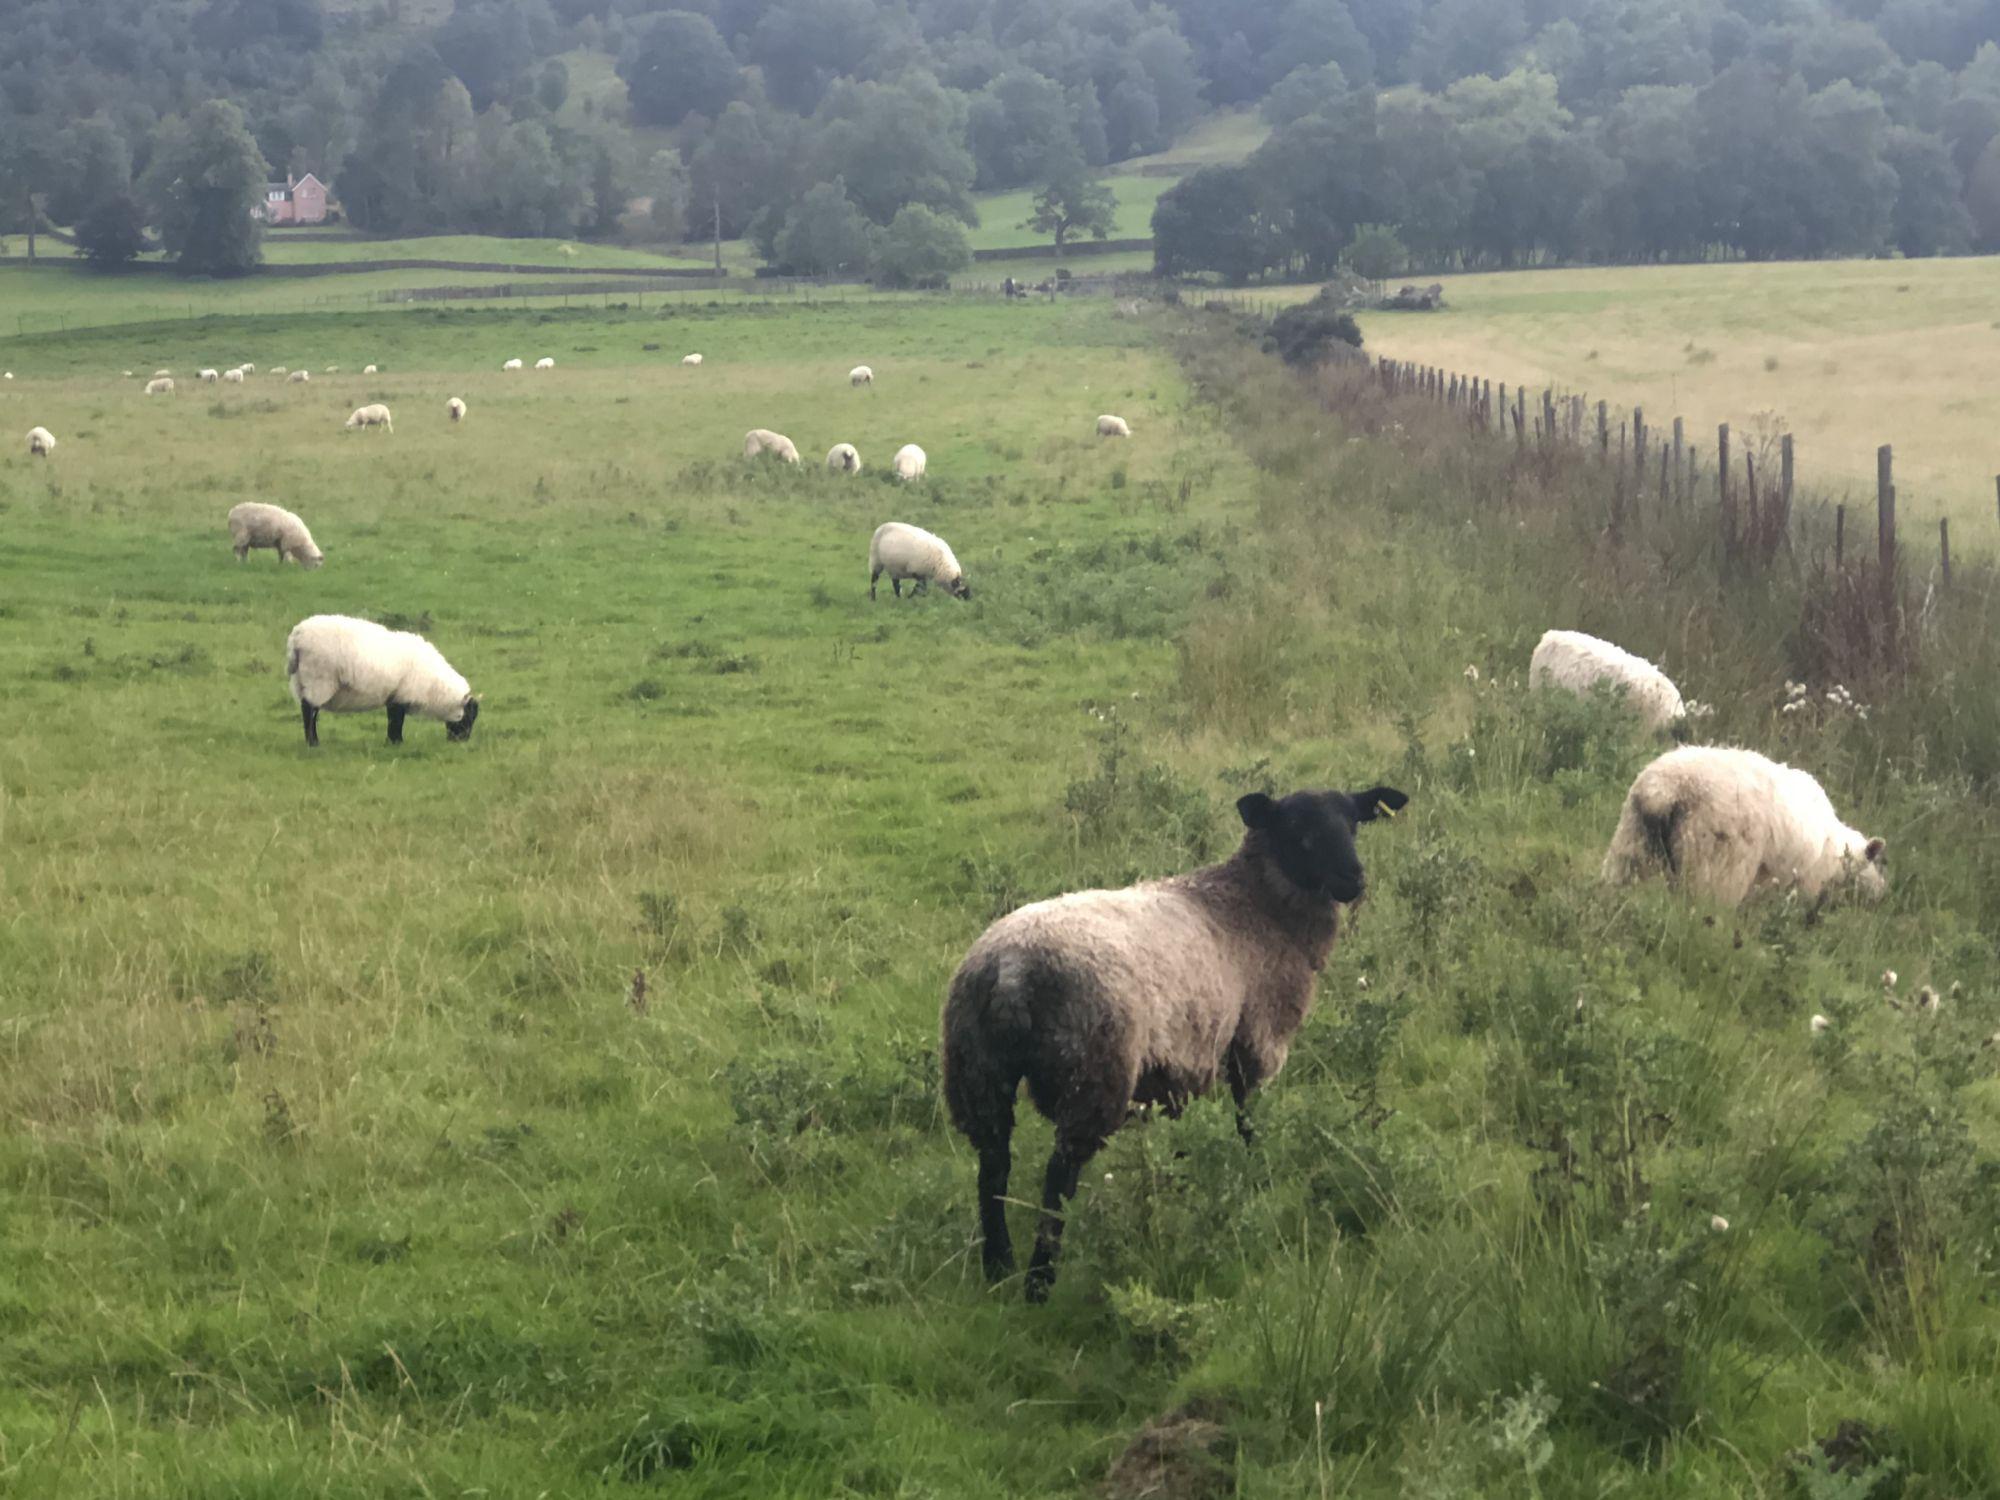 Sheep, sheep and more sheep!